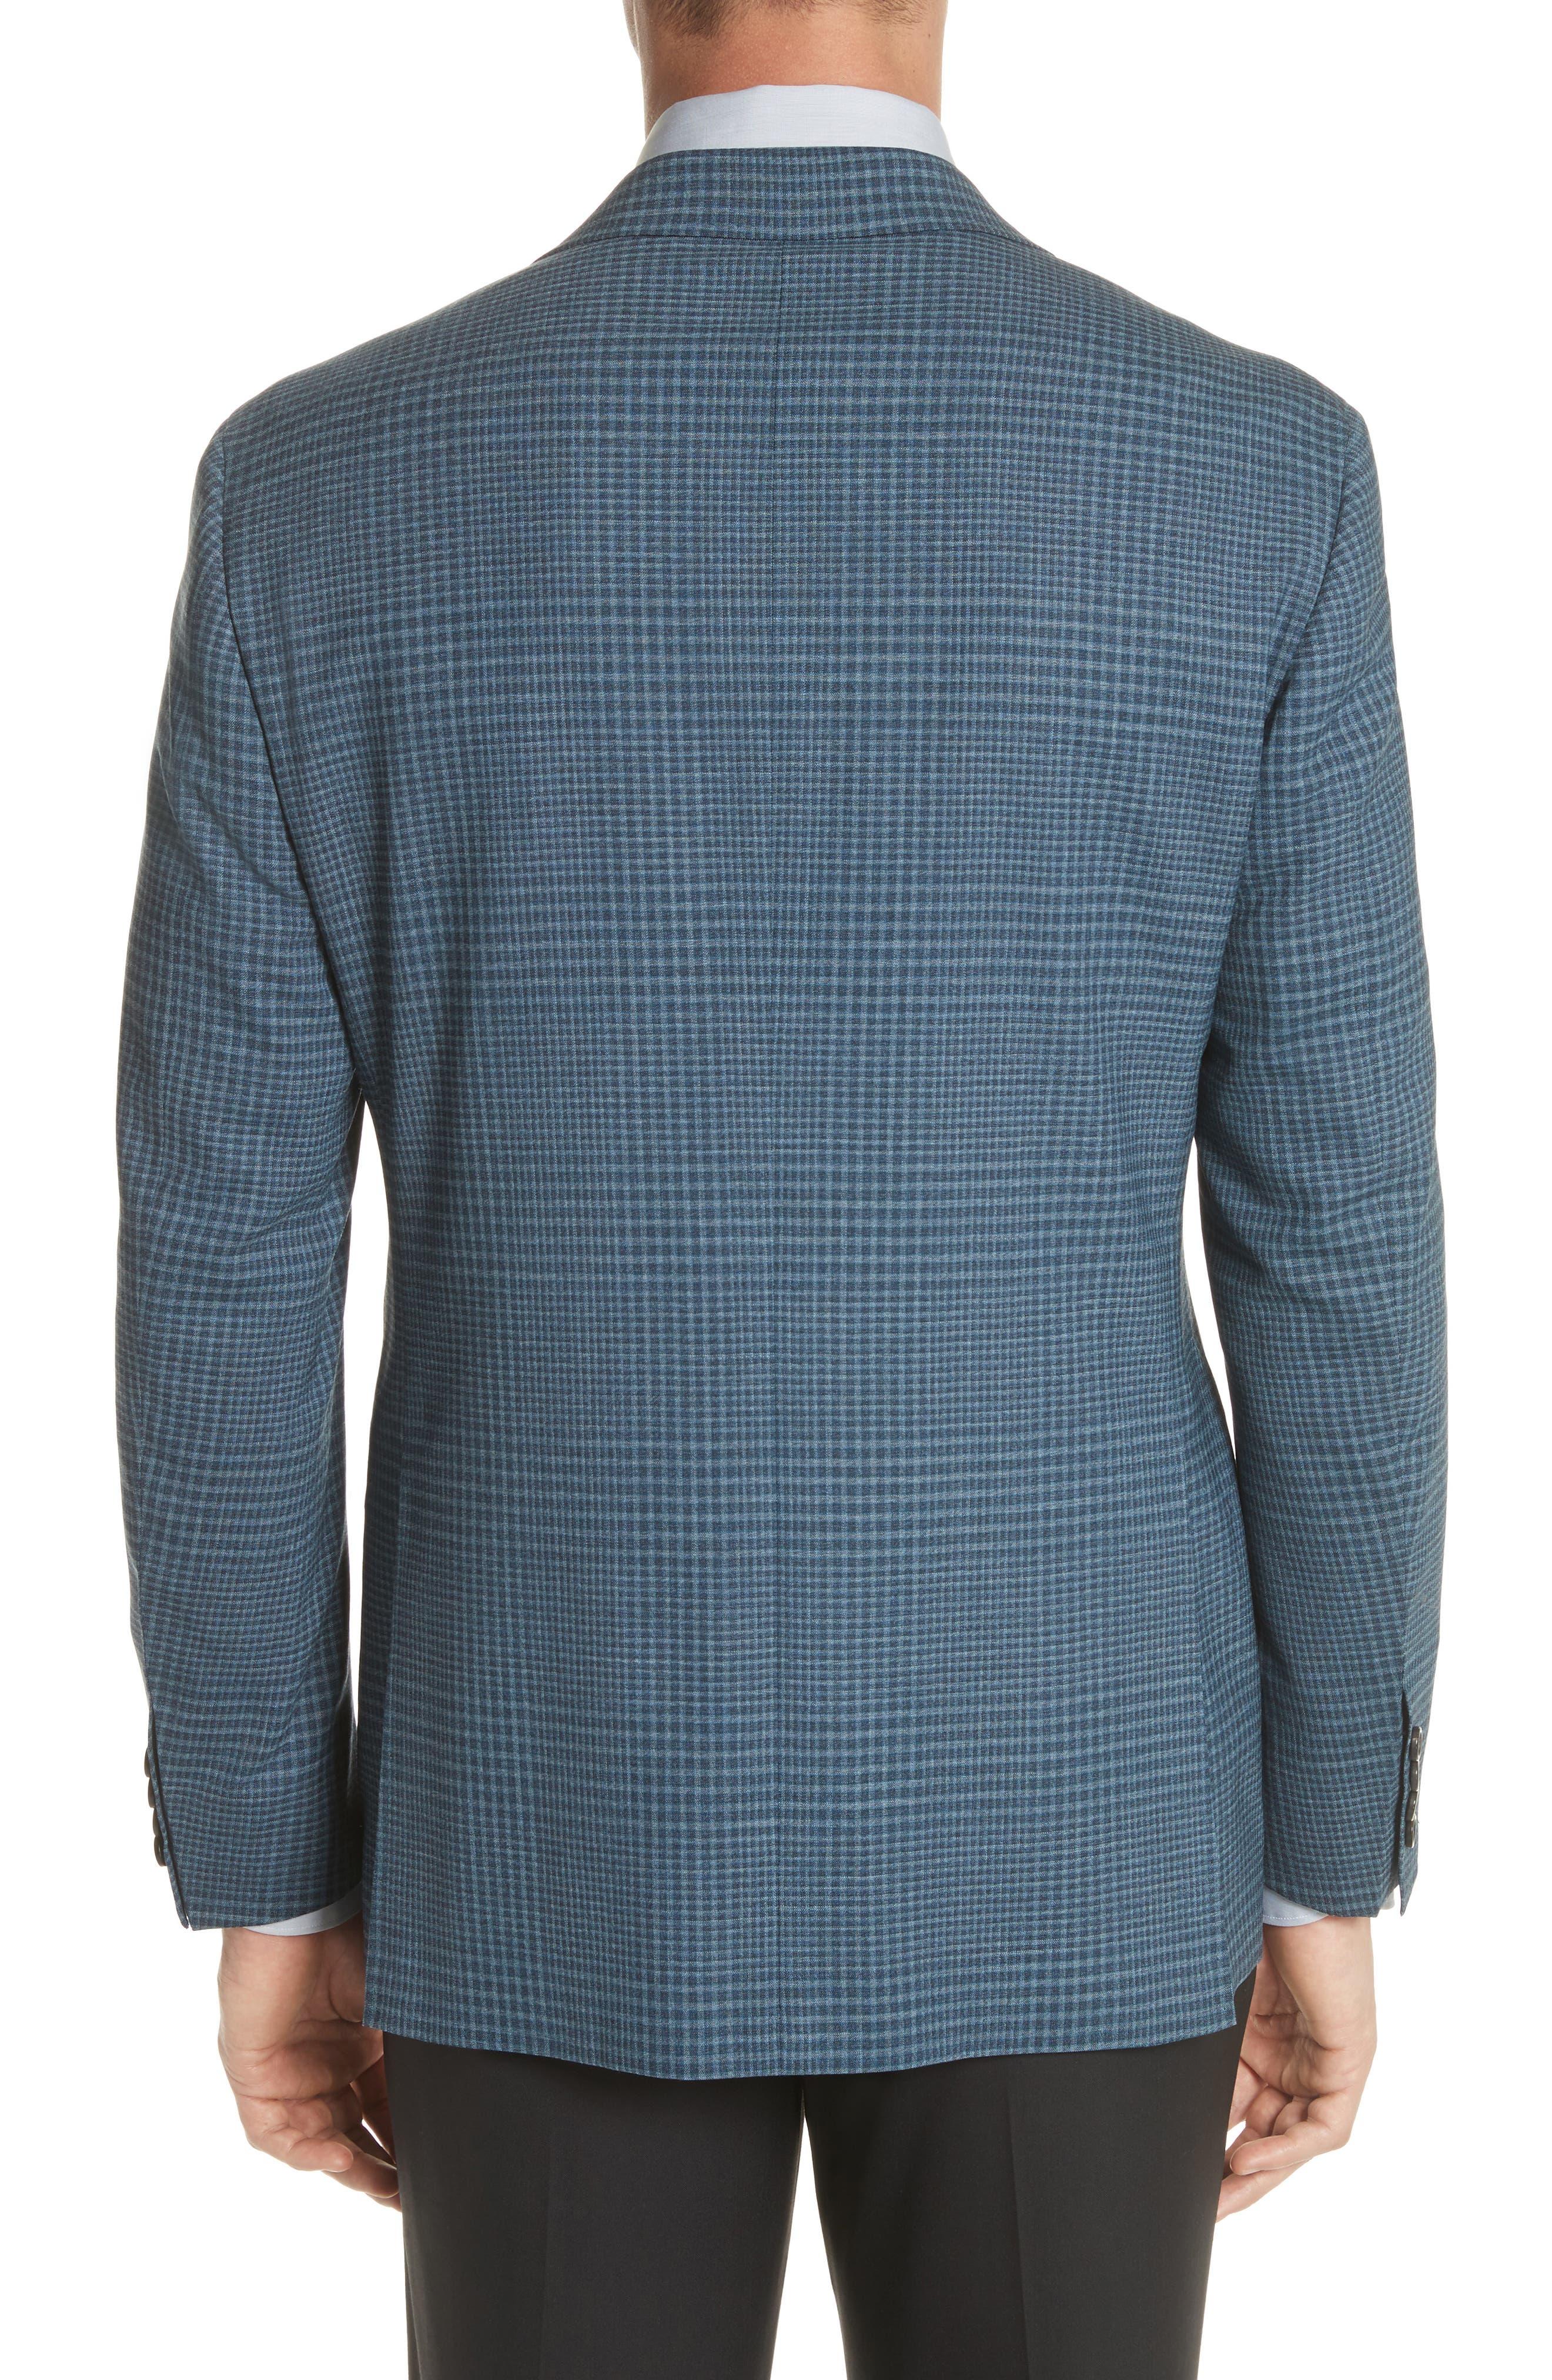 Kei Classic Fit Plaid Wool Sport Coat,                             Alternate thumbnail 2, color,                             Navy